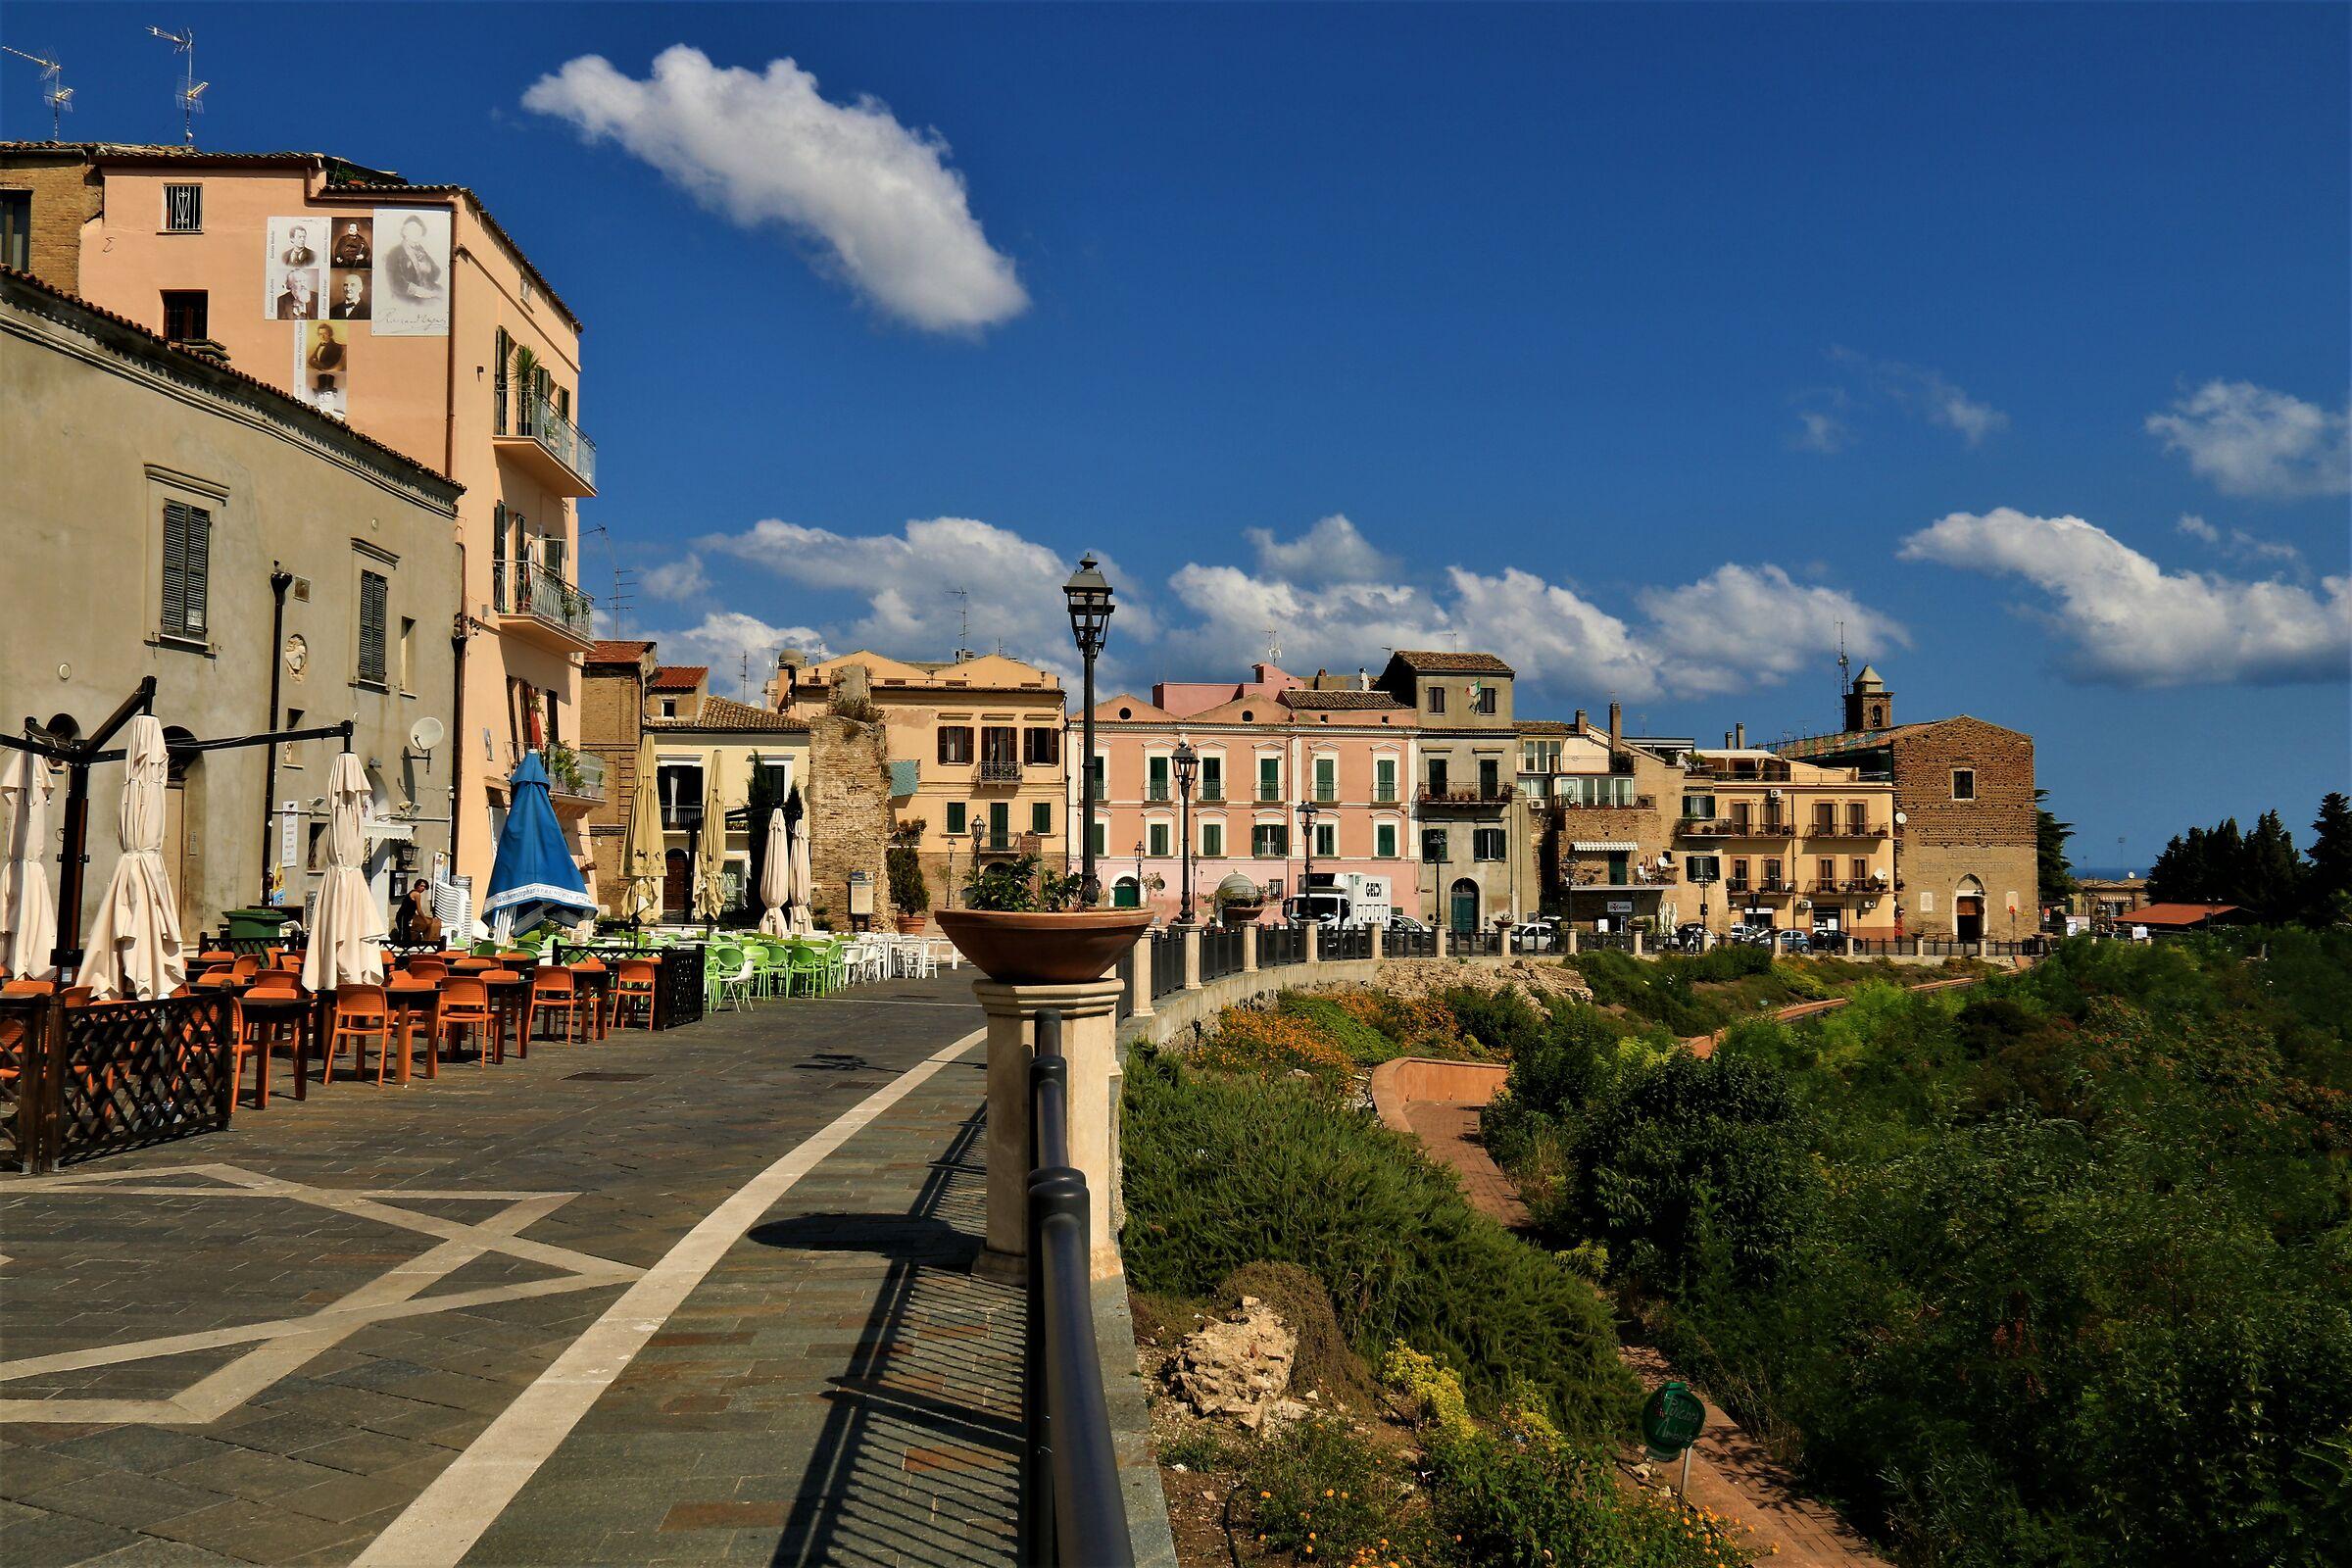 Via Adriatica in Vasto (CH)...